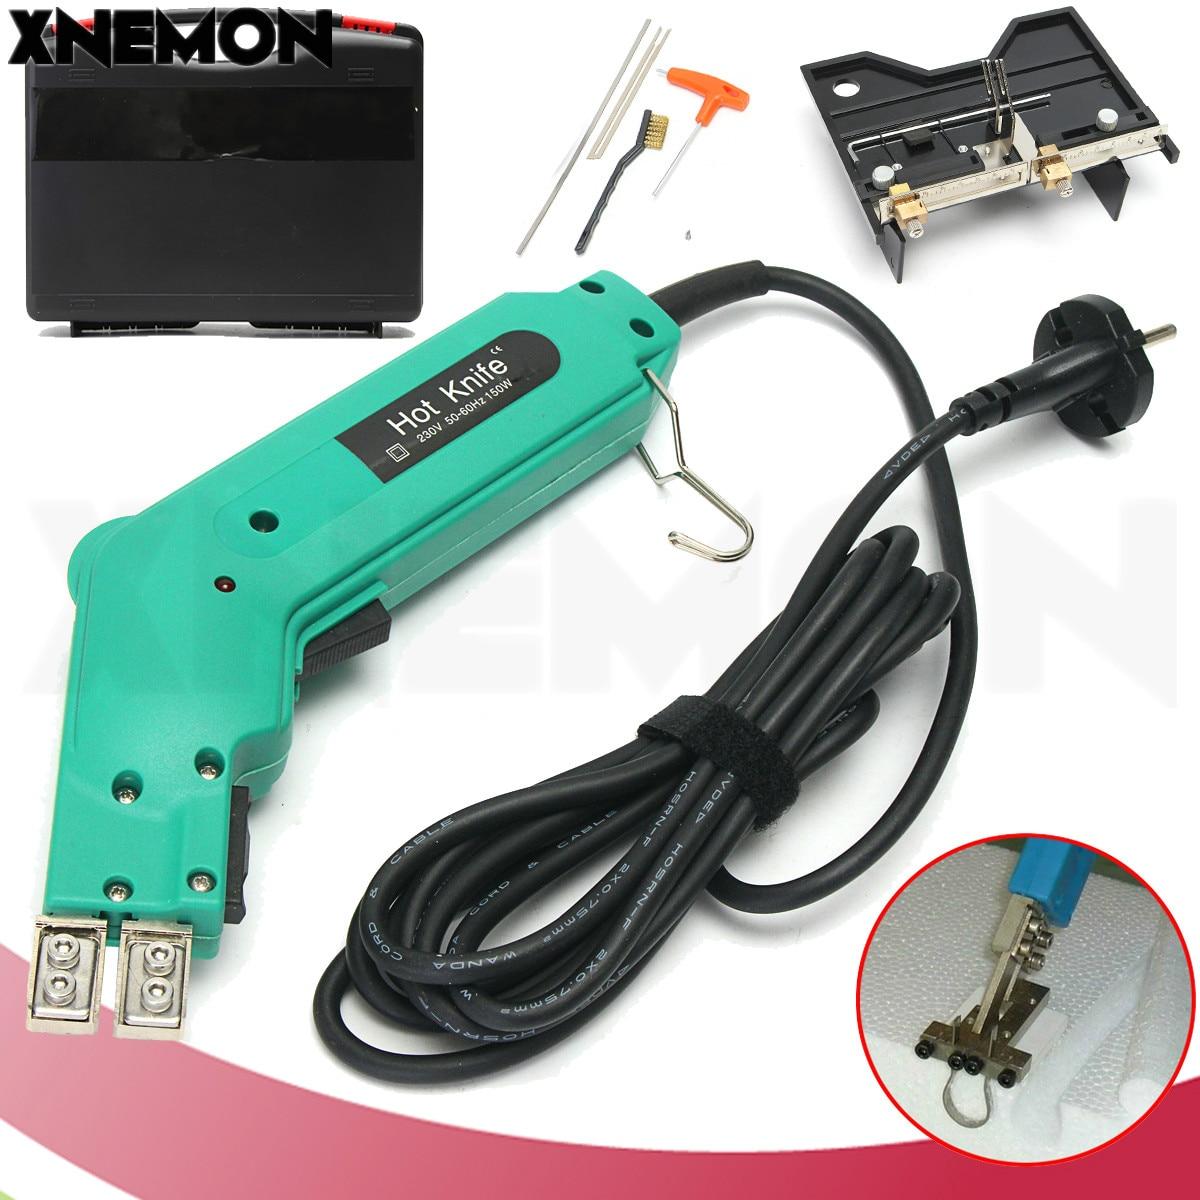 XNEMON Groove Electric Hot Knife Foam Cutter Hot Wire Styrofoam Craft Tool Cutting Grooving Heating Machine 220V Foam Cutting